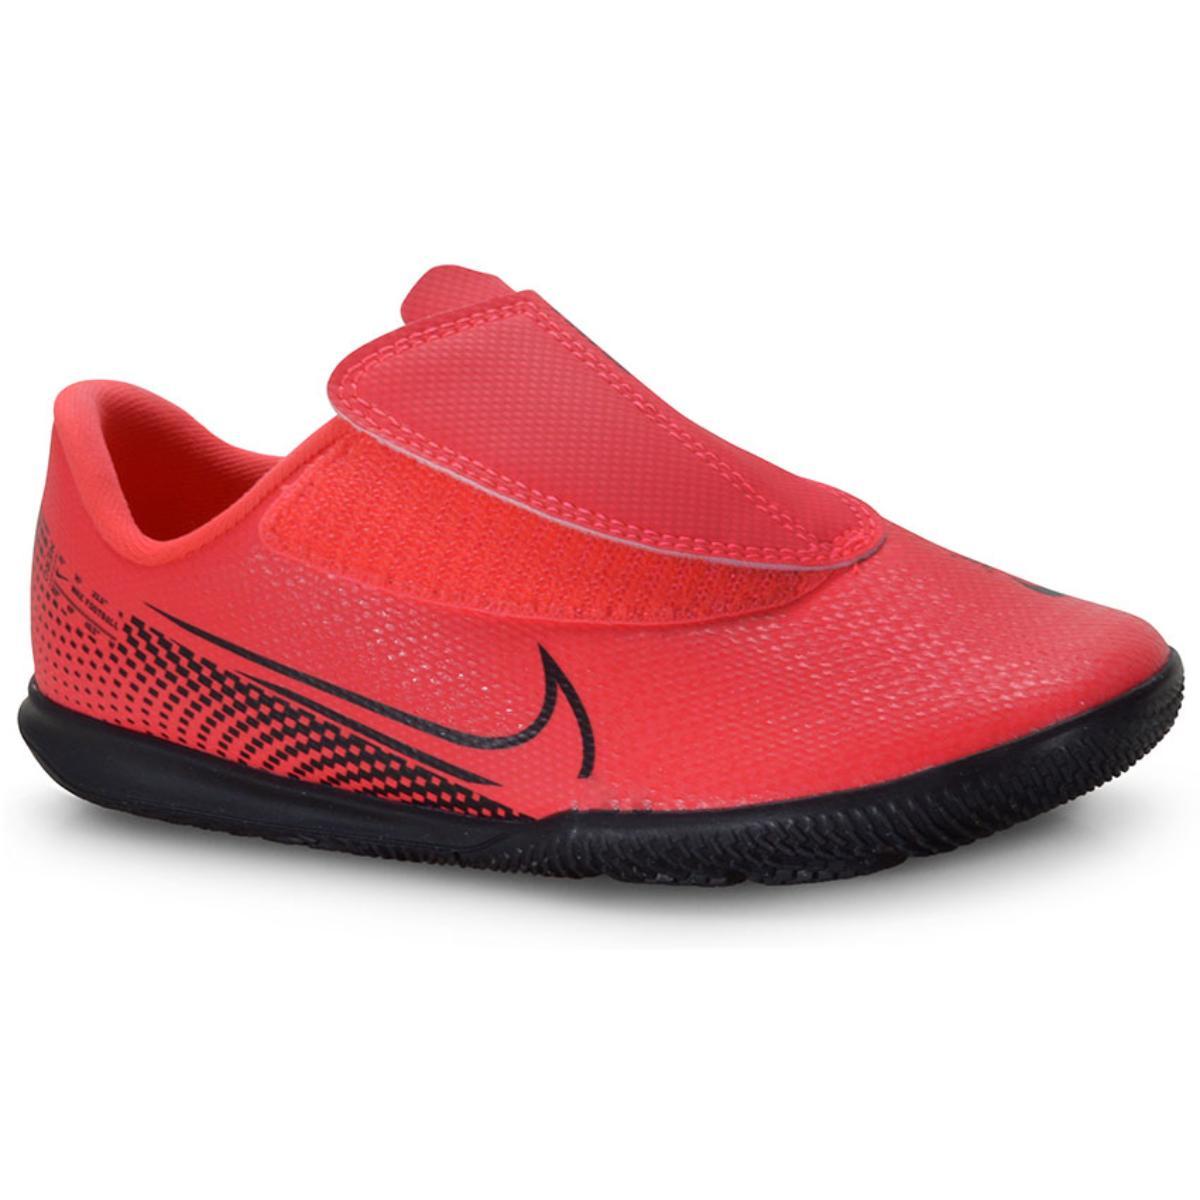 Tênis Masc Infantil Nike At8170-606 Mercurial Vapor 13 Club Coral/preto